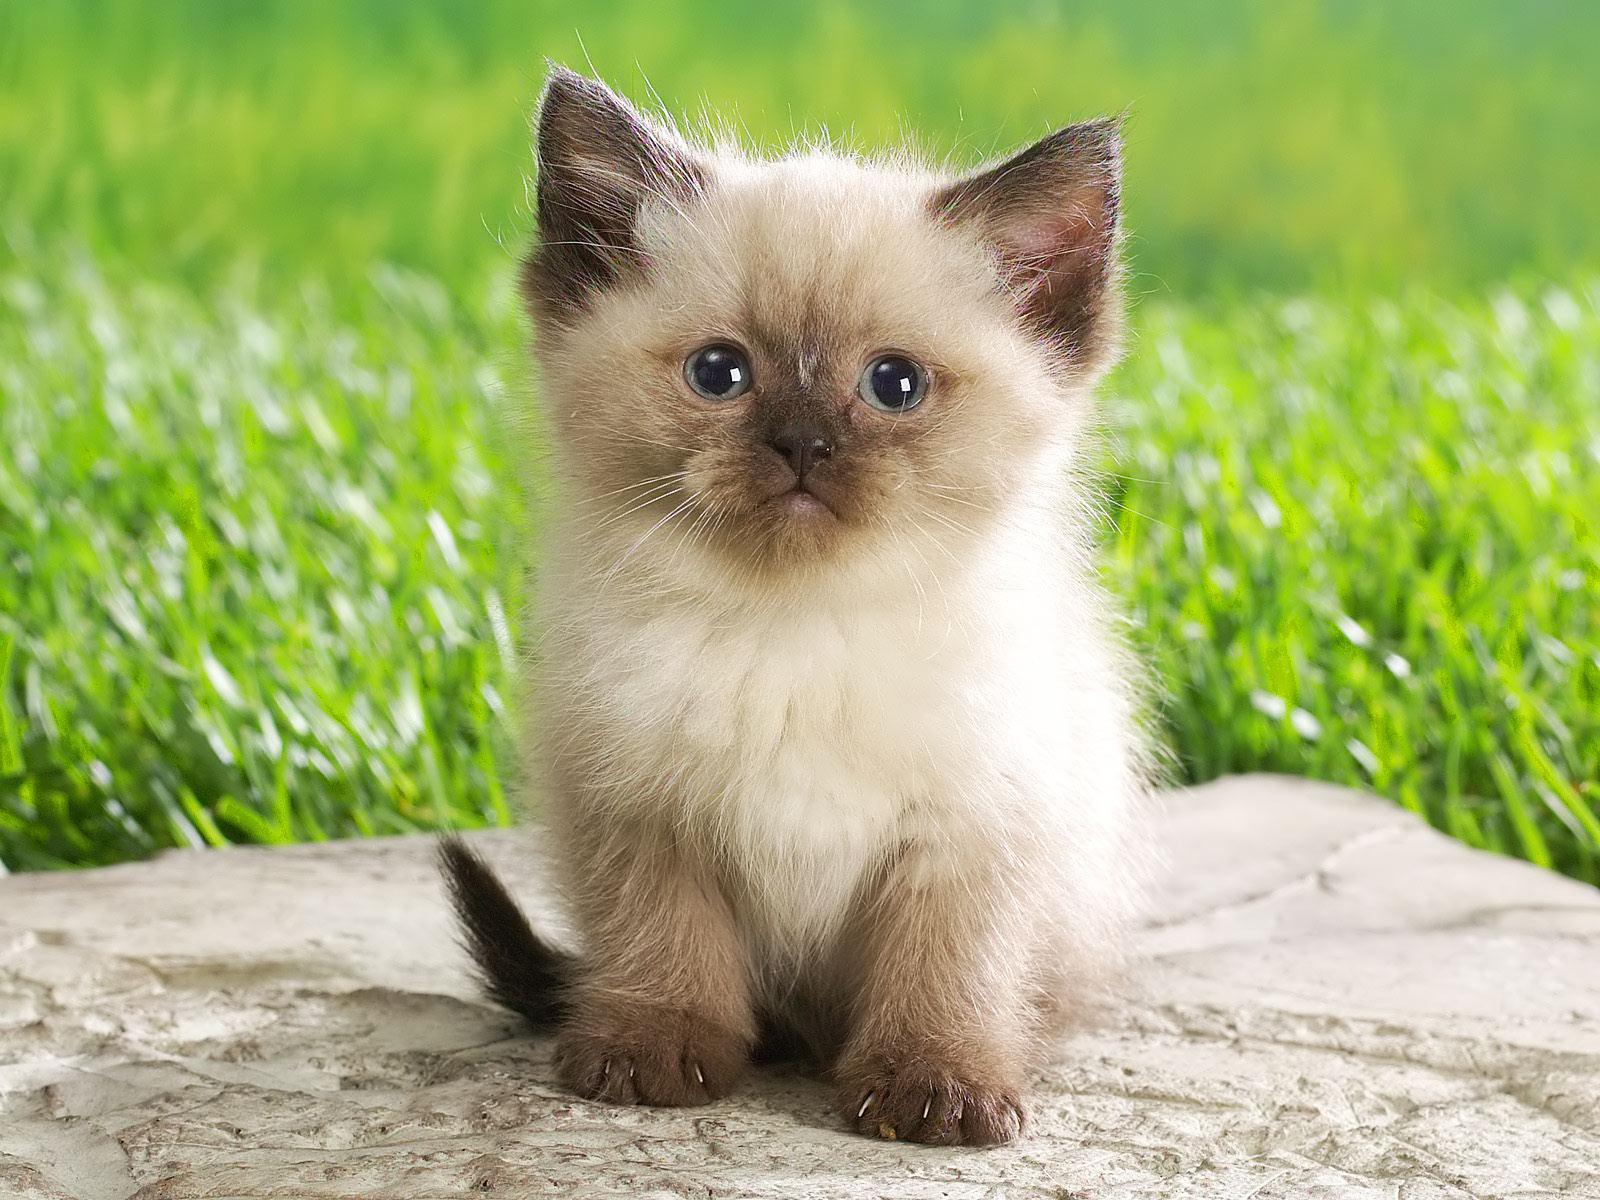 download foto kucing lucu - gambar hewan - download foto kucing lucu